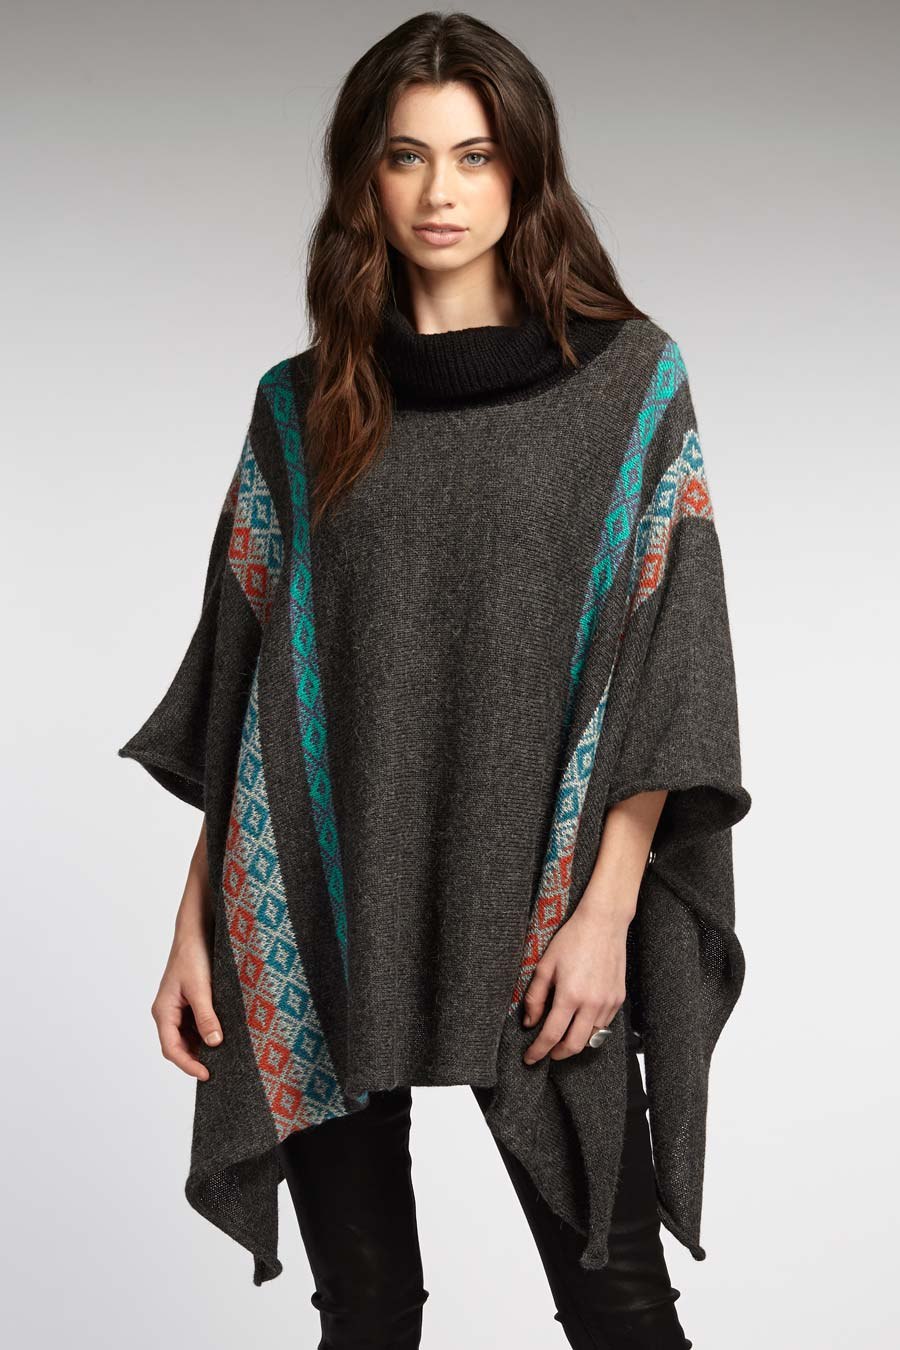 womens-ponchos-gray-knit-alpaca-fair-isle-poncho-fair-trade-gift-ethical-fashion-2